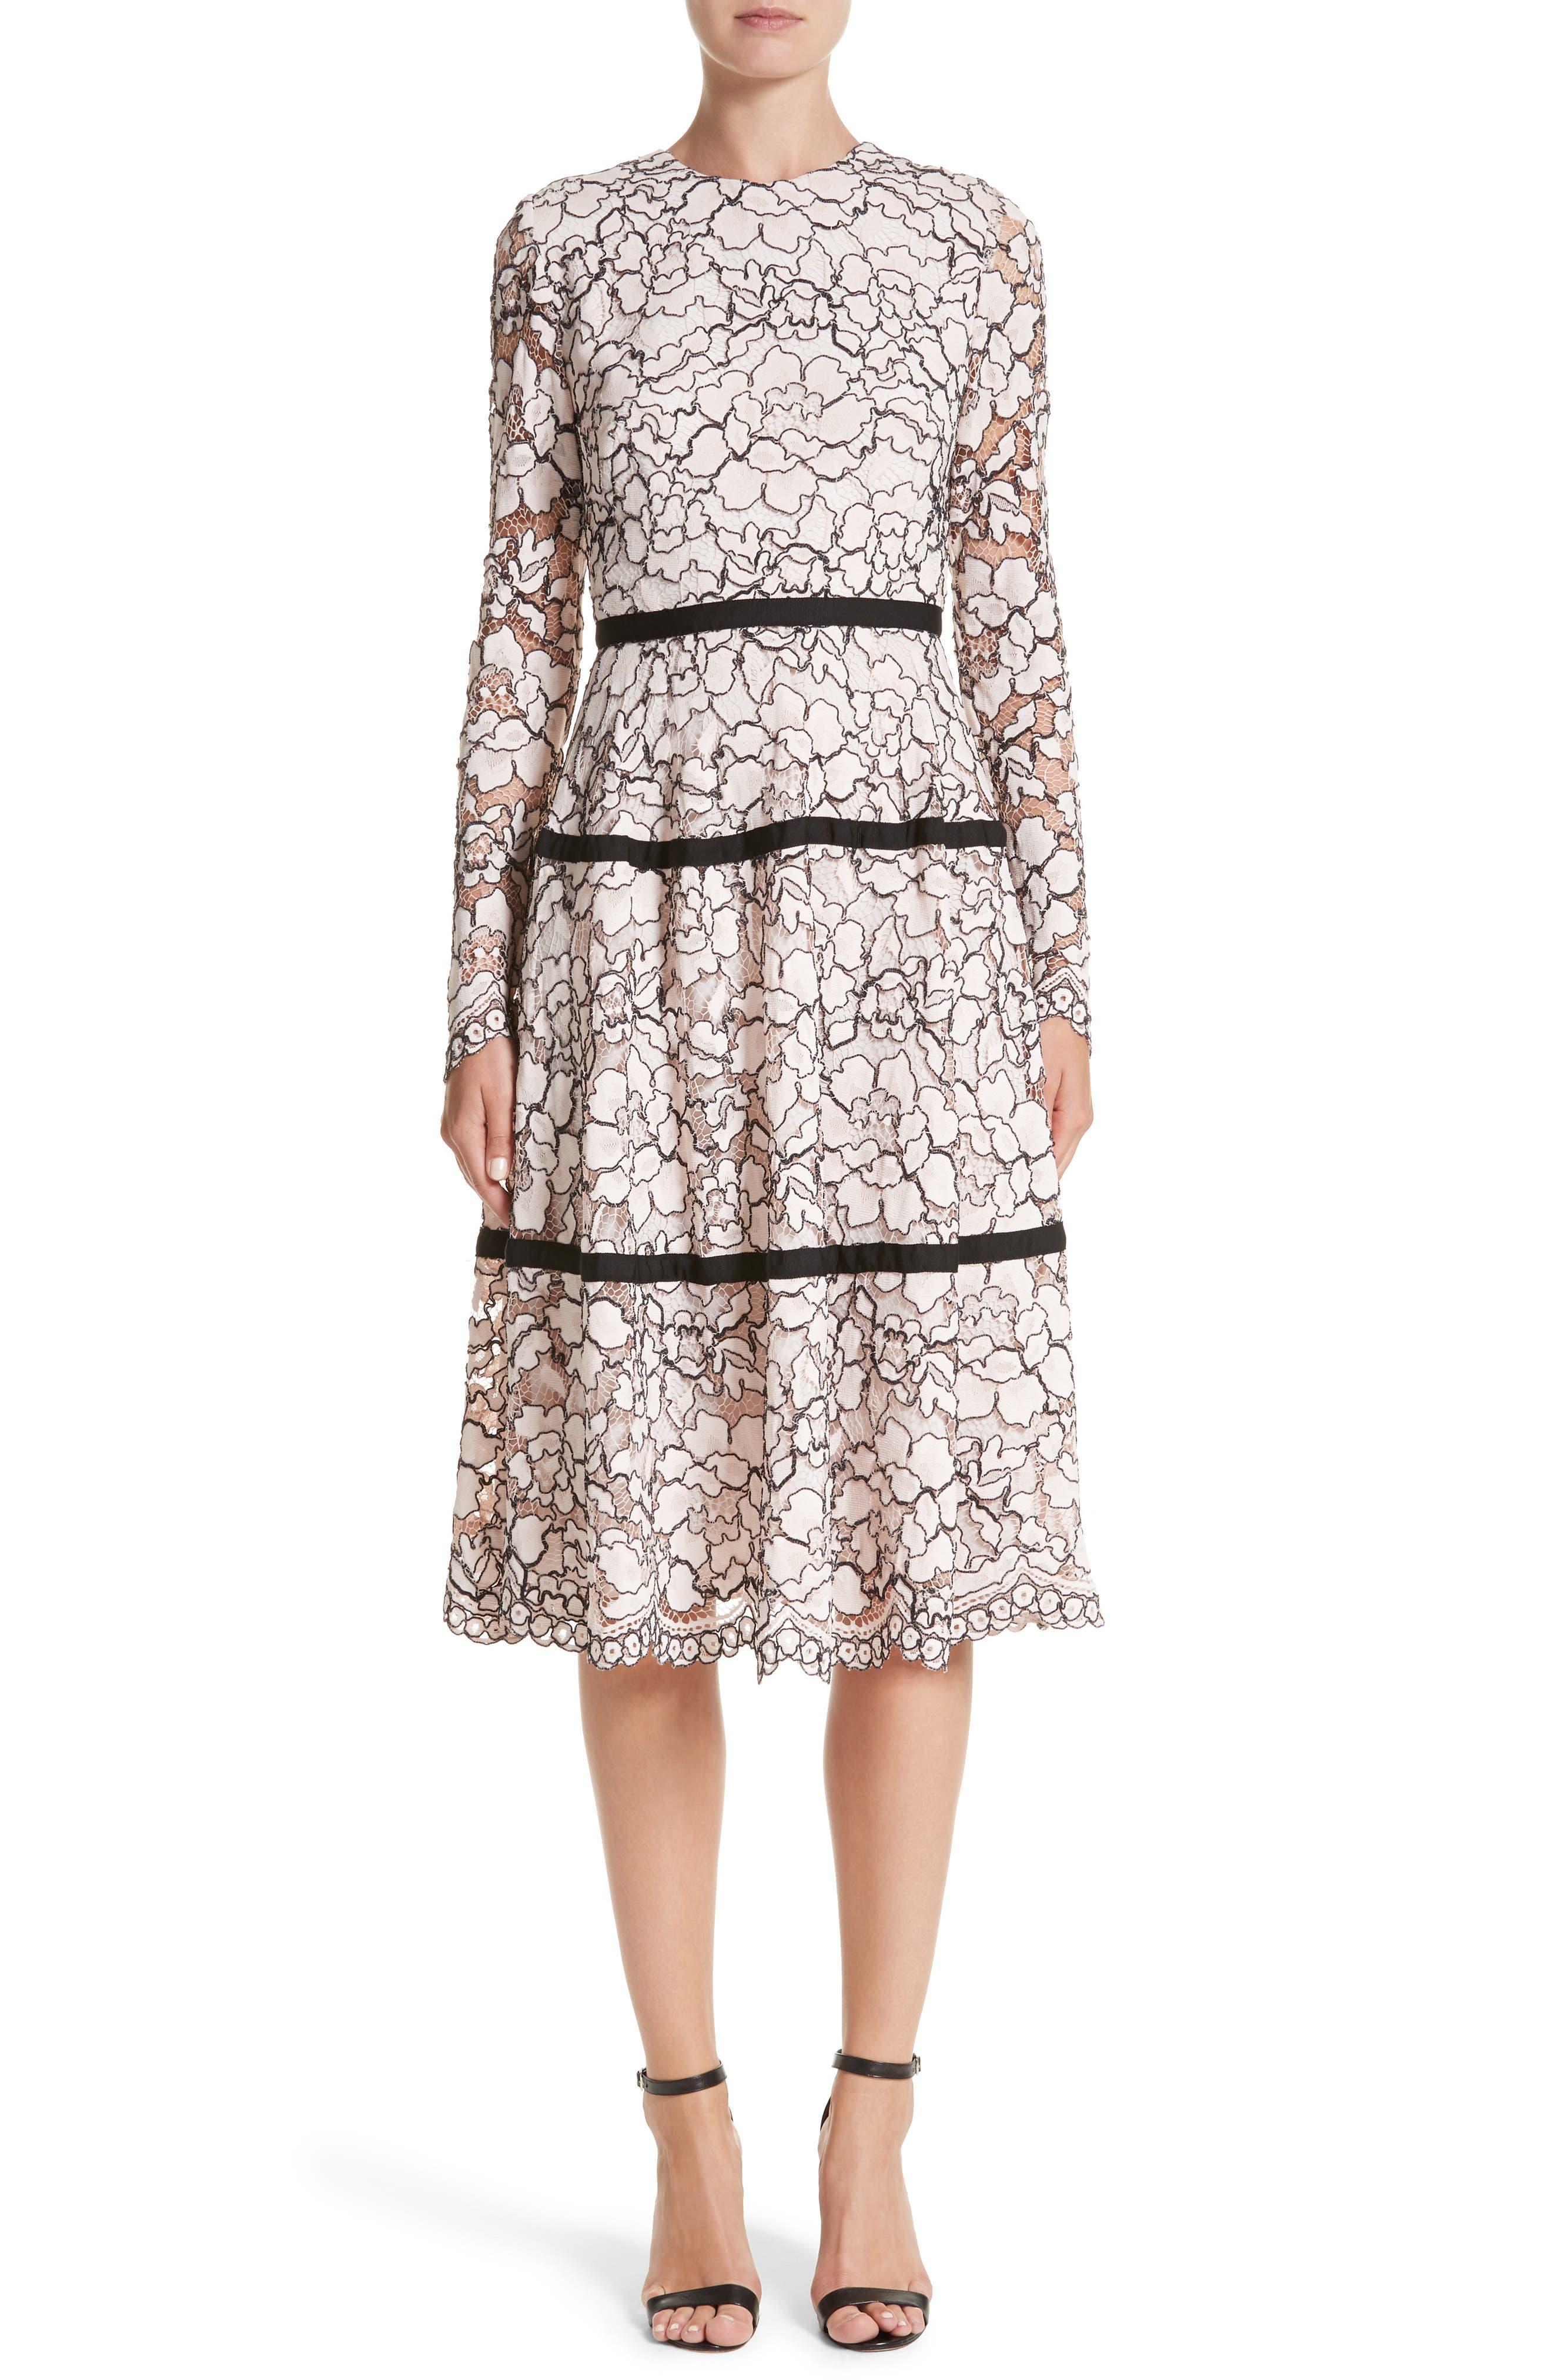 Lela Rose Dresses On Sale